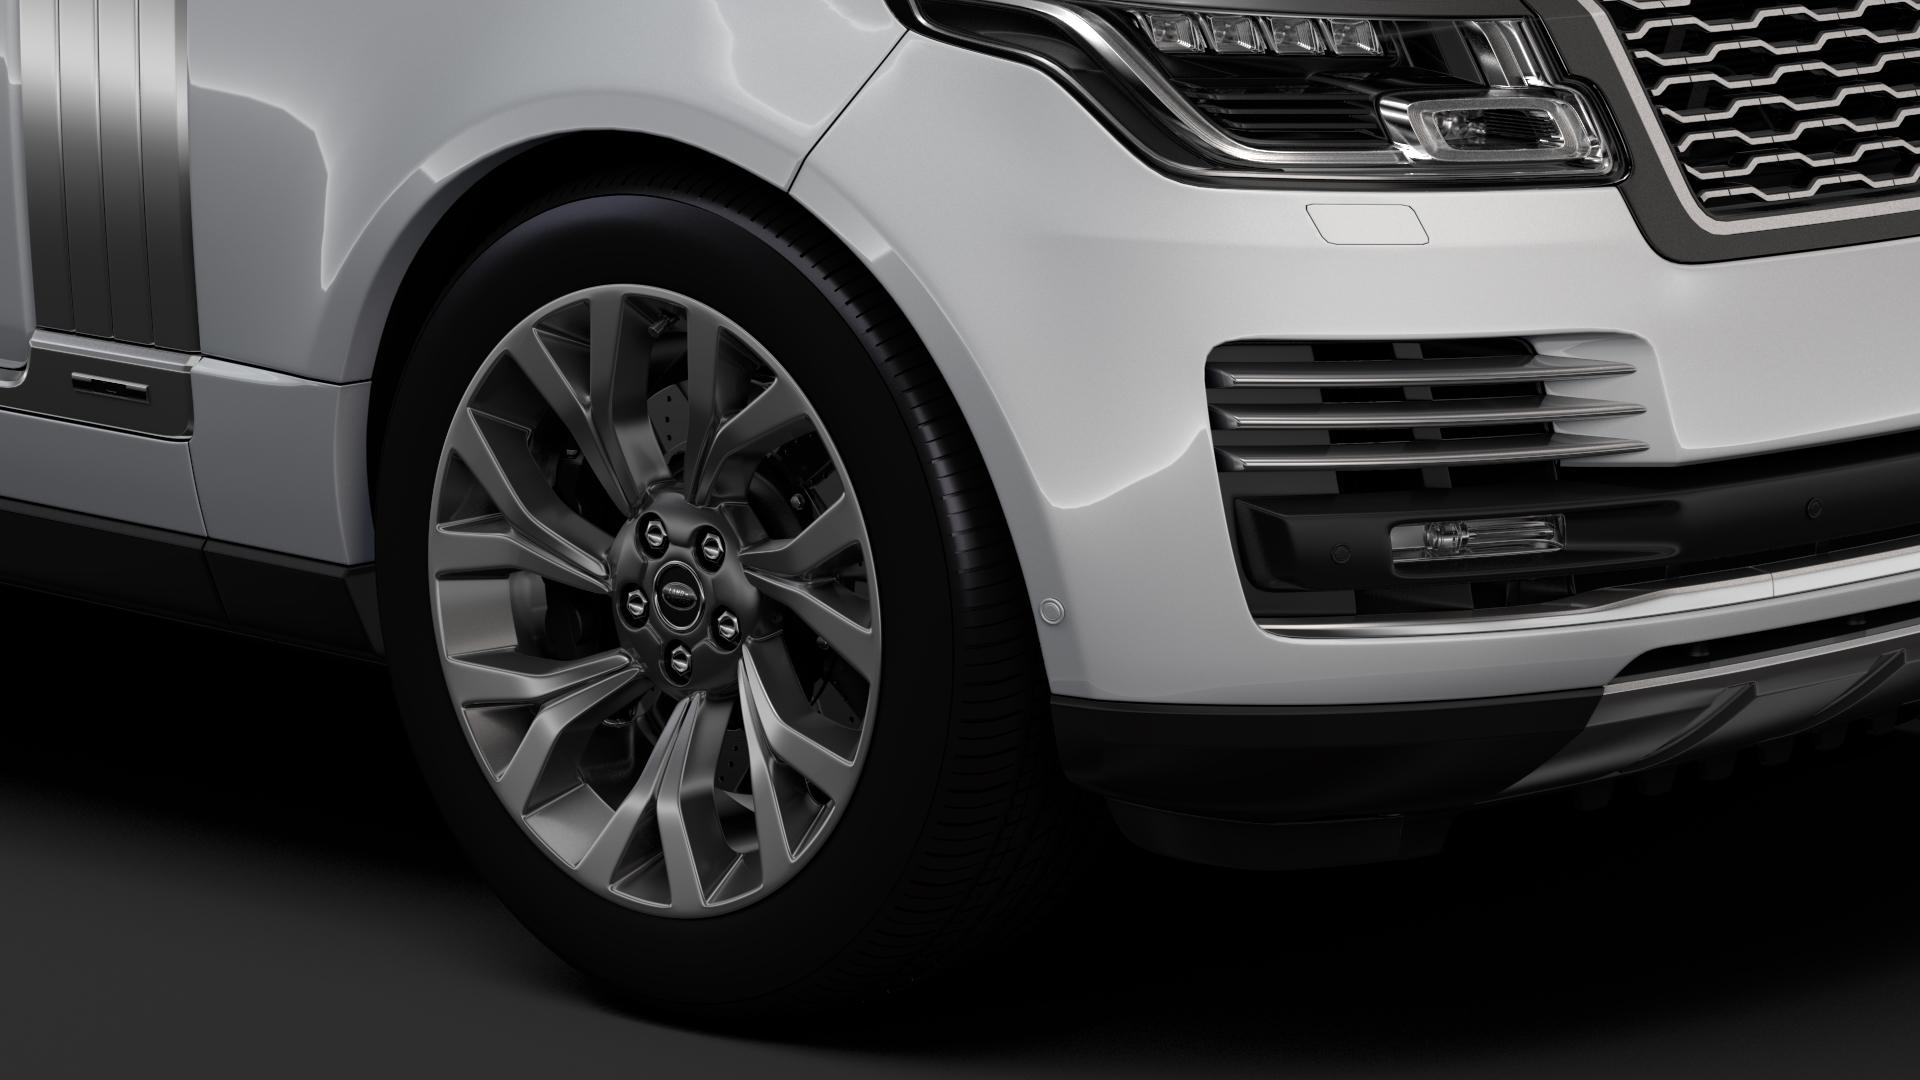 range rover autobiography p400e lwb l405 2018 3d model fbx c4d lwo ma mb hrc xsi obj 277357